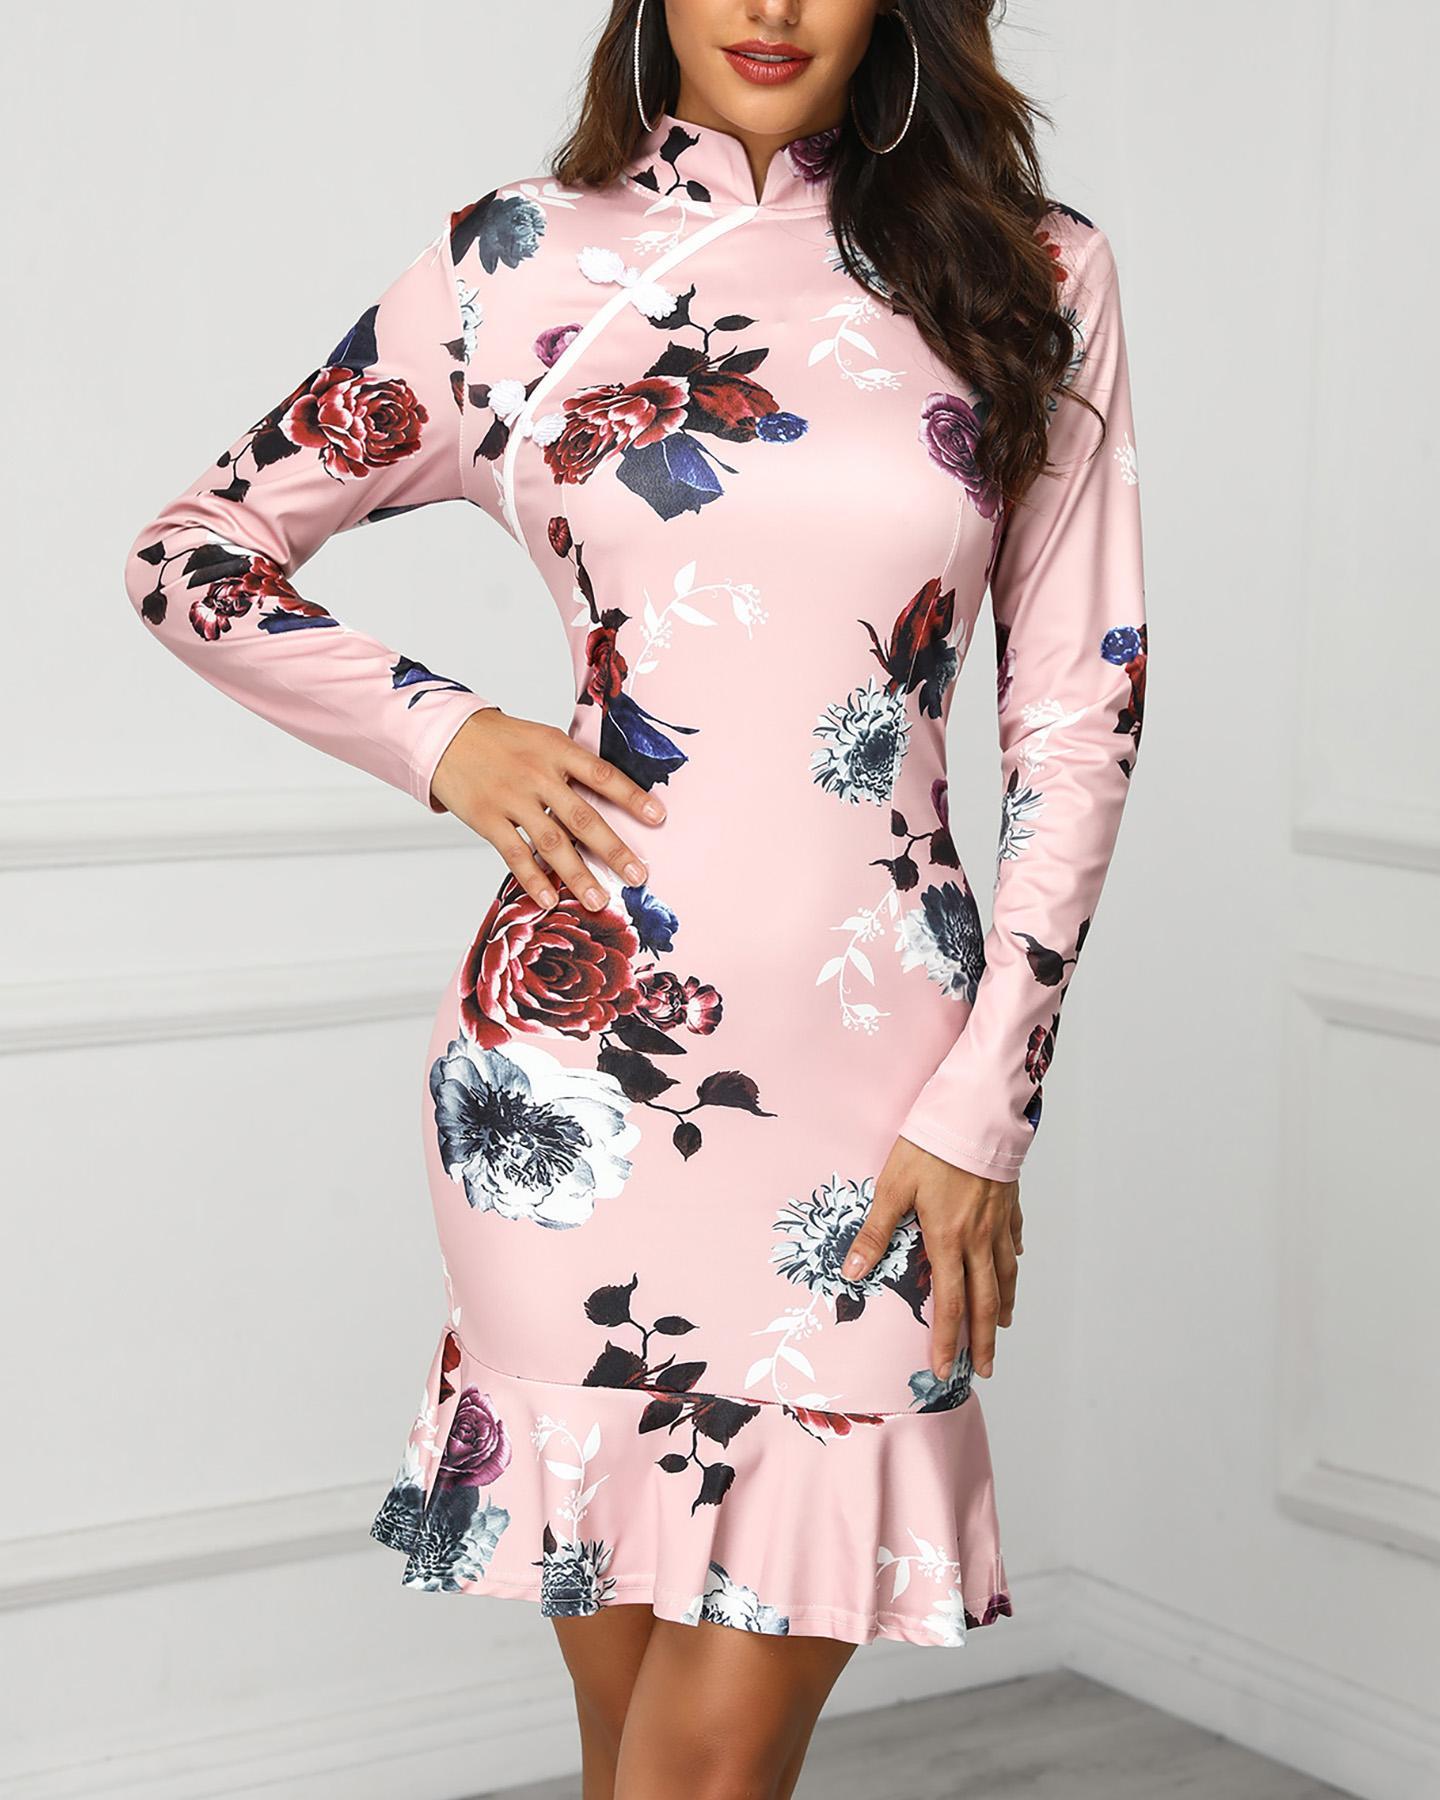 Floral Print Ruffles Bodycon Dress